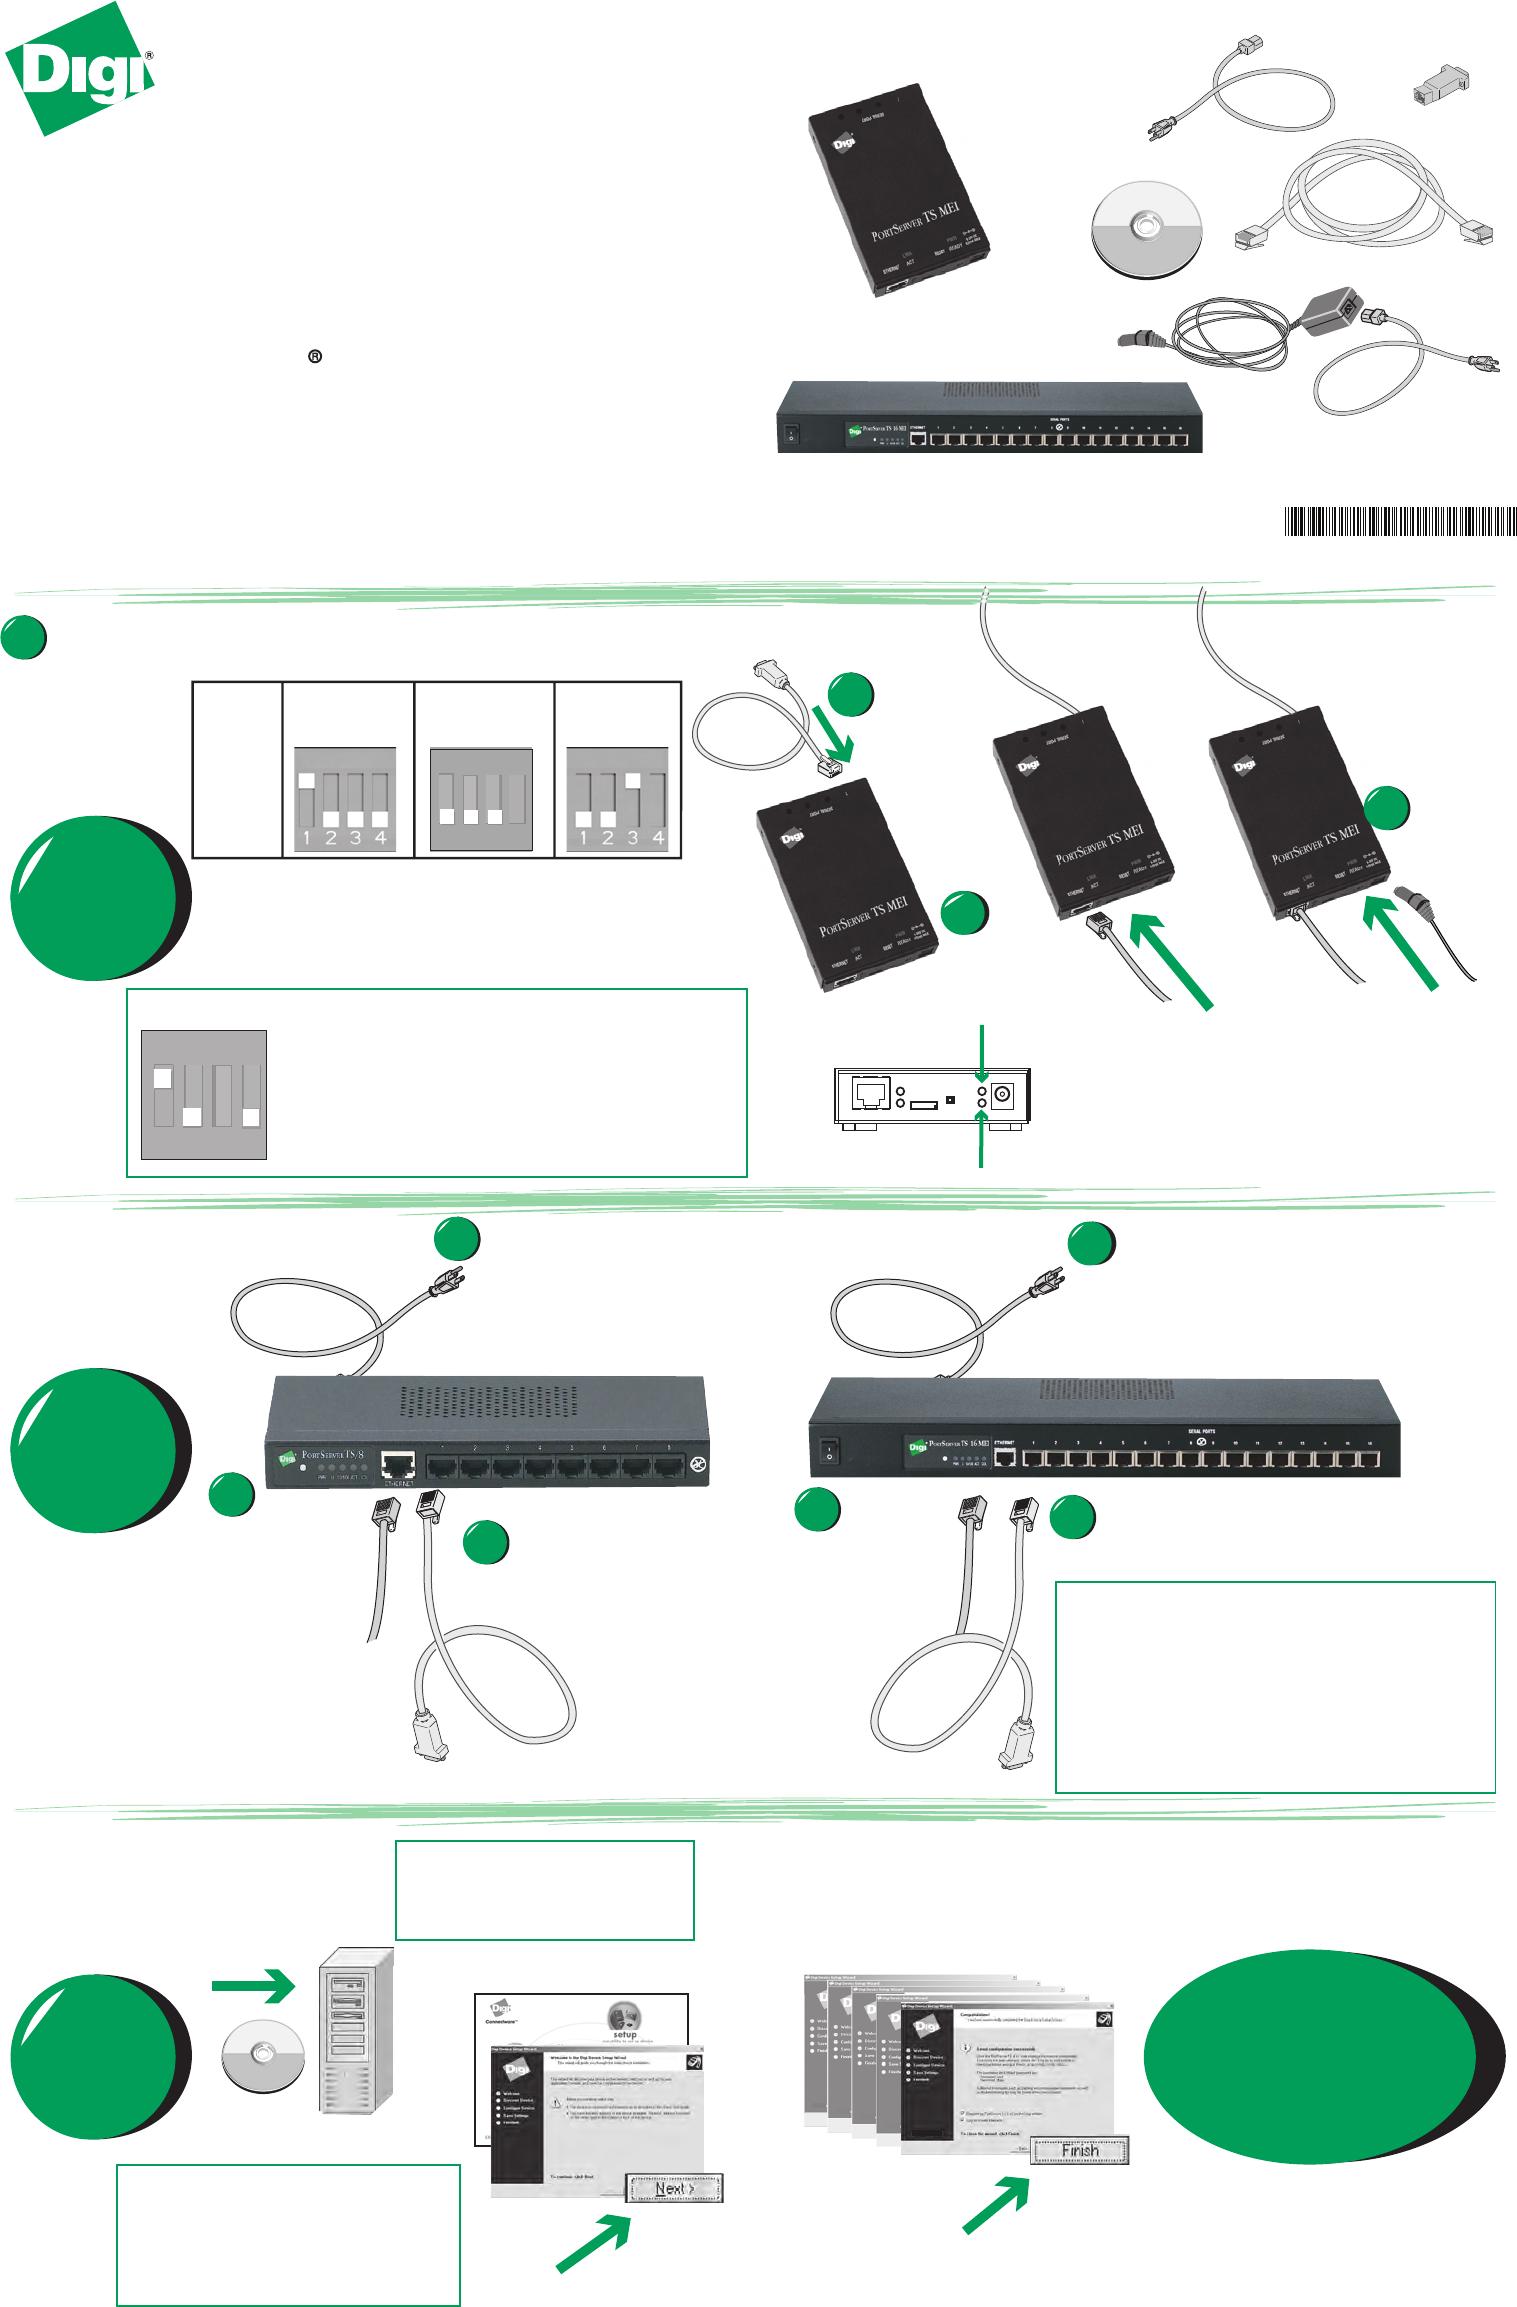 Digi Serial Console Adapter 76000697